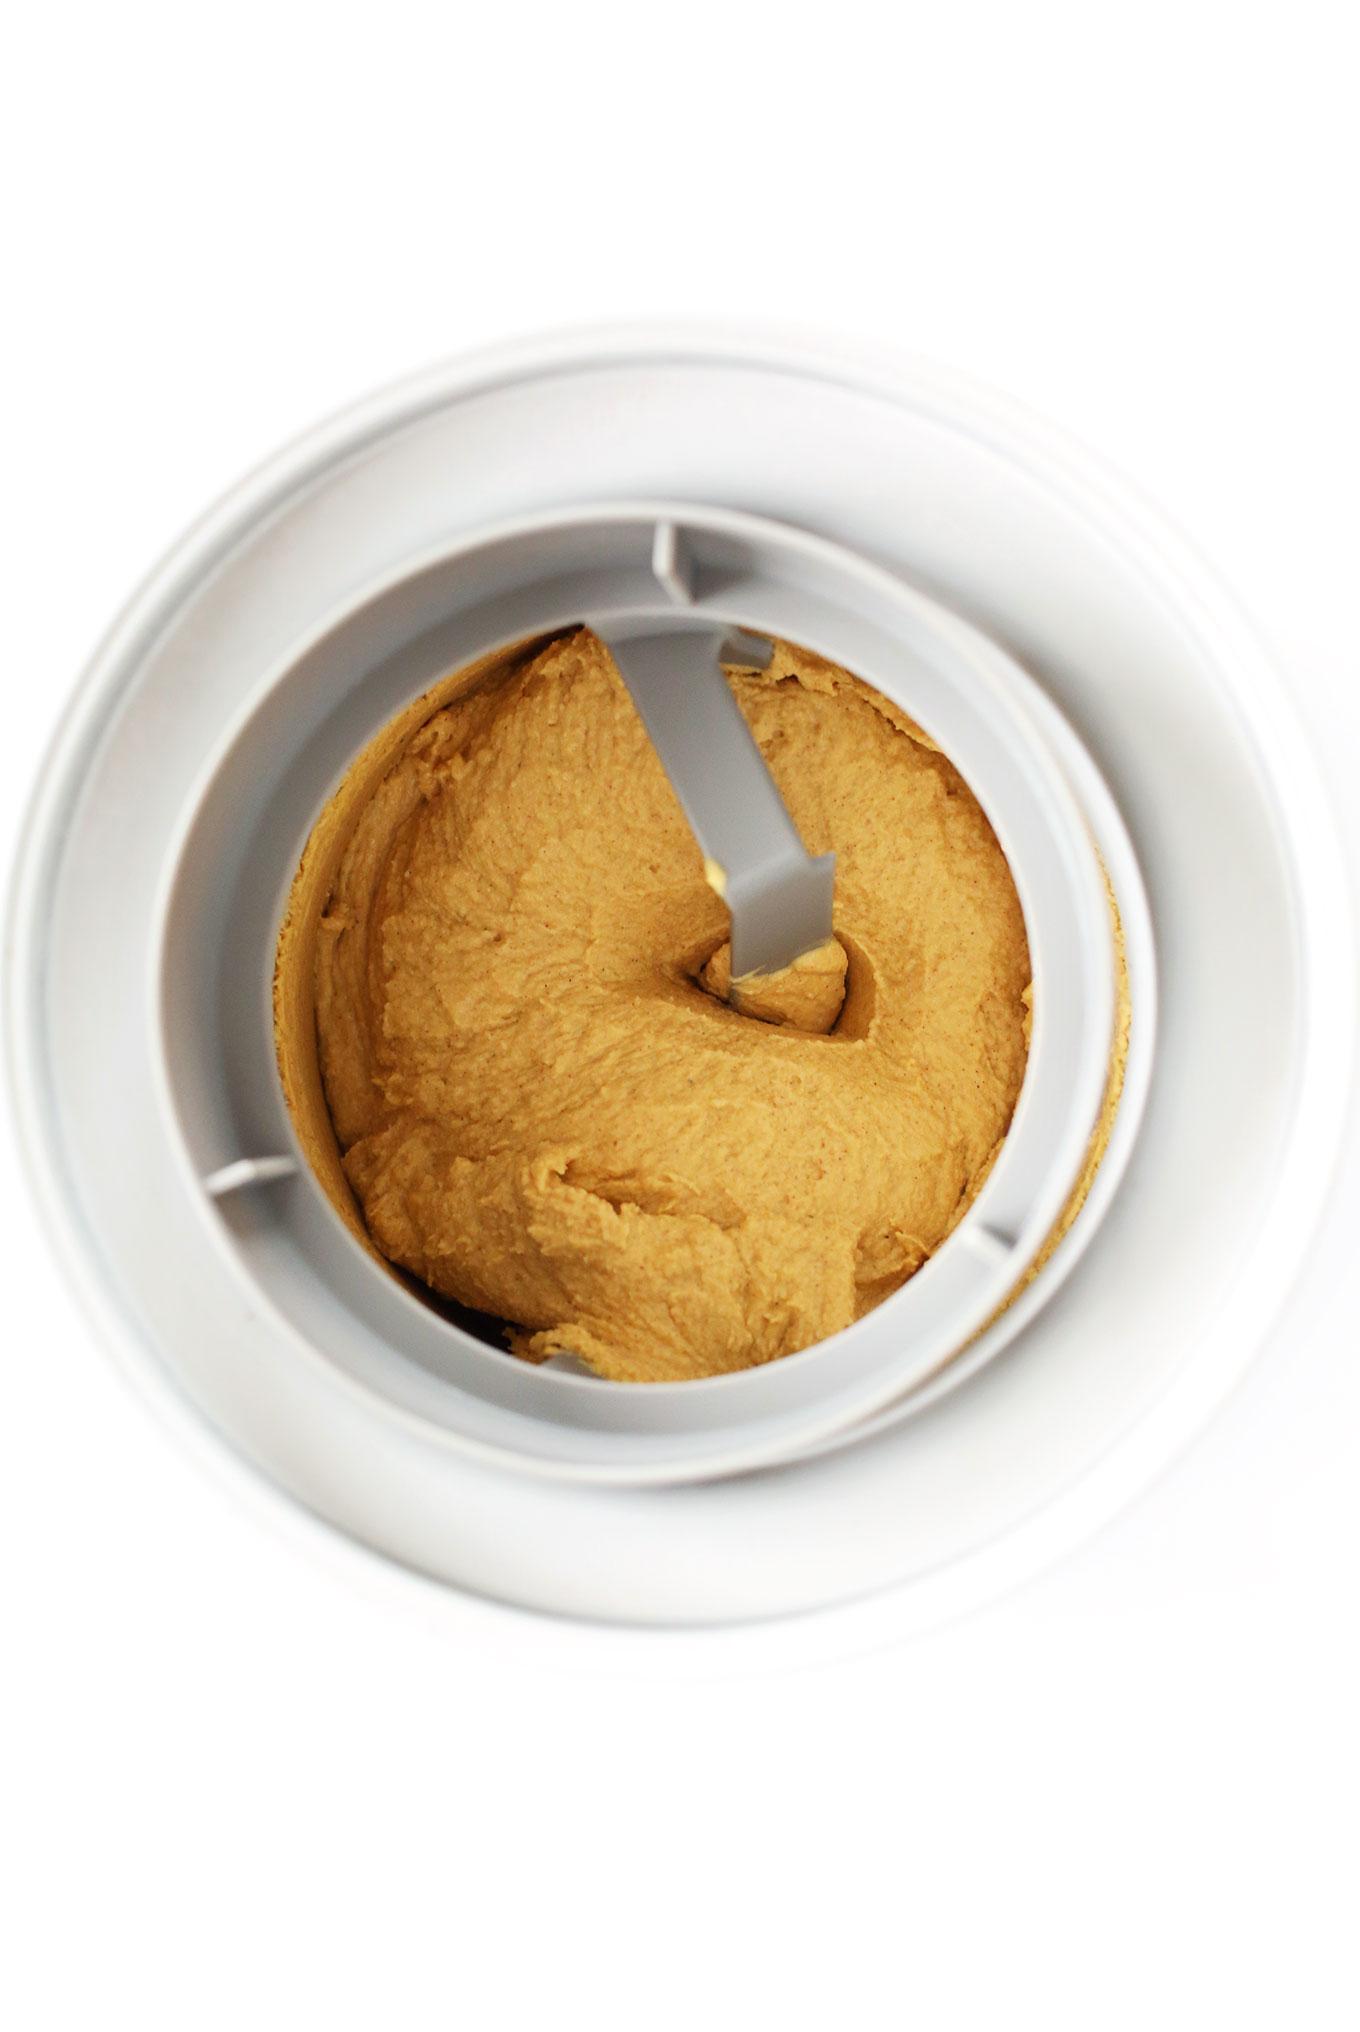 Using an ice cream maker to make gluten-free vegan Pumpkin Pie Ice Cream